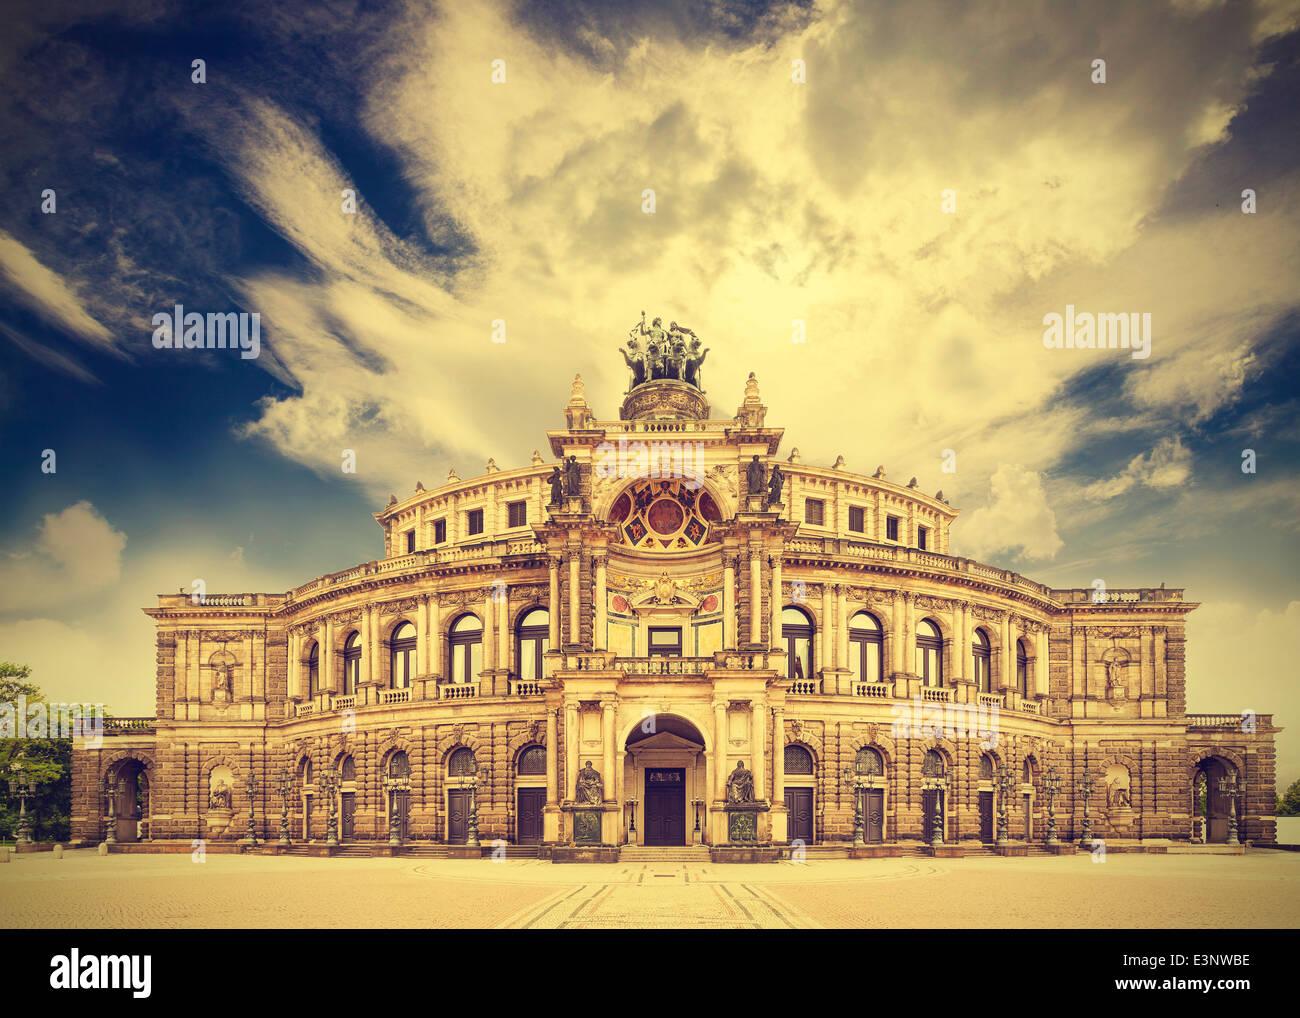 Dresden opera theater, Germany, retro vintage effect. - Stock Image